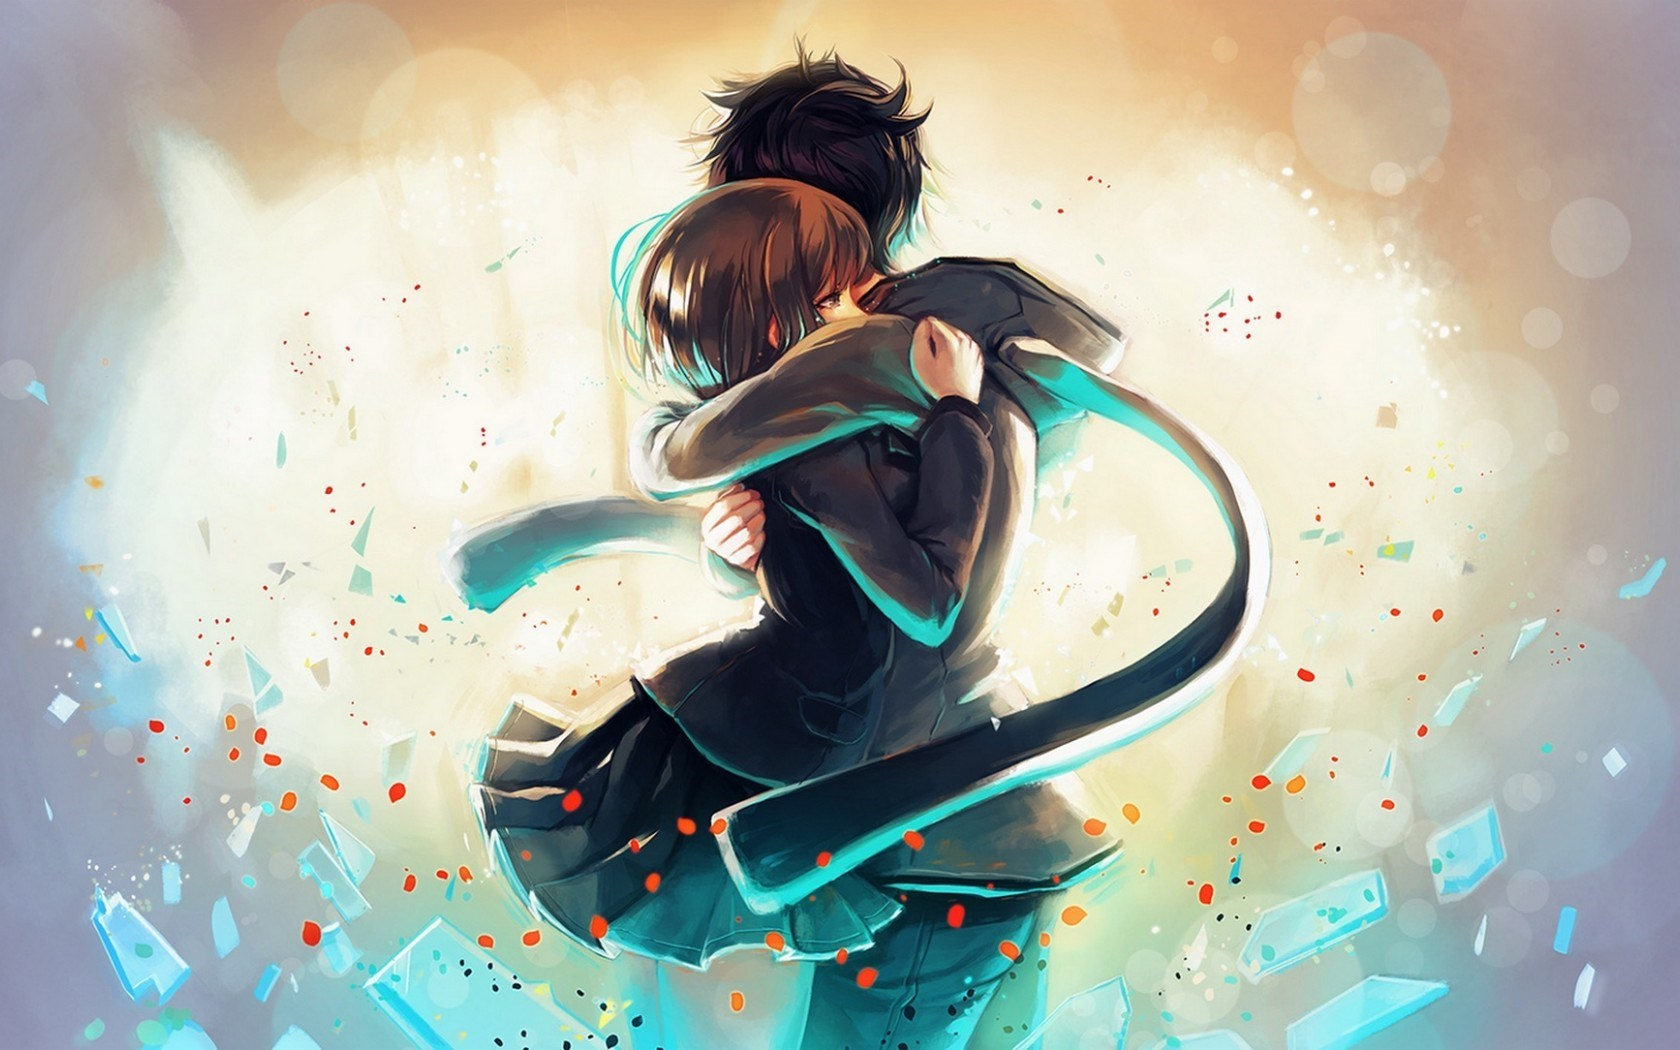 image - anime-love-wallpaper-1 | legends of the multi universe